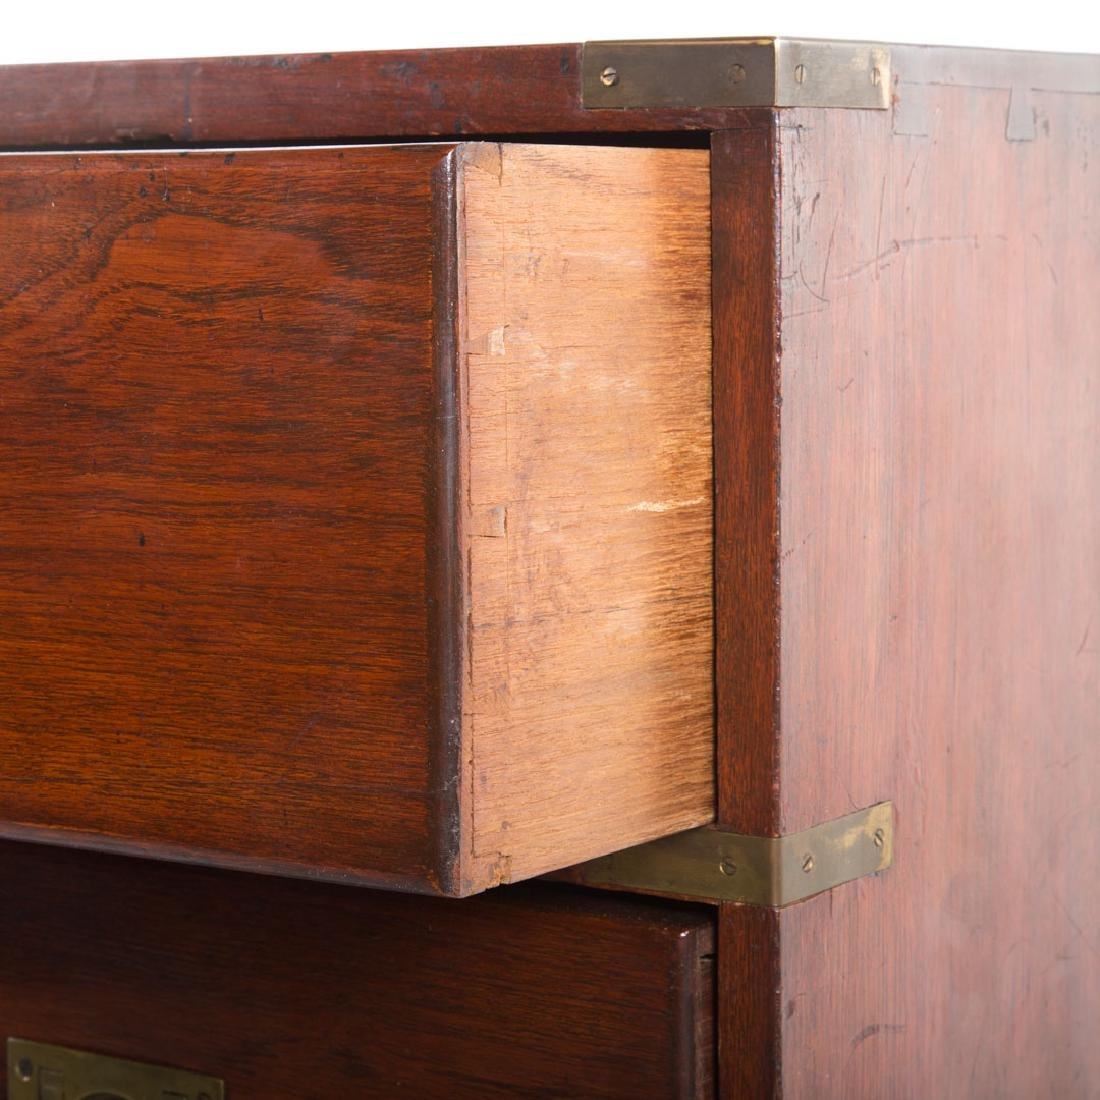 Victorian elmwood campaign chest - 2